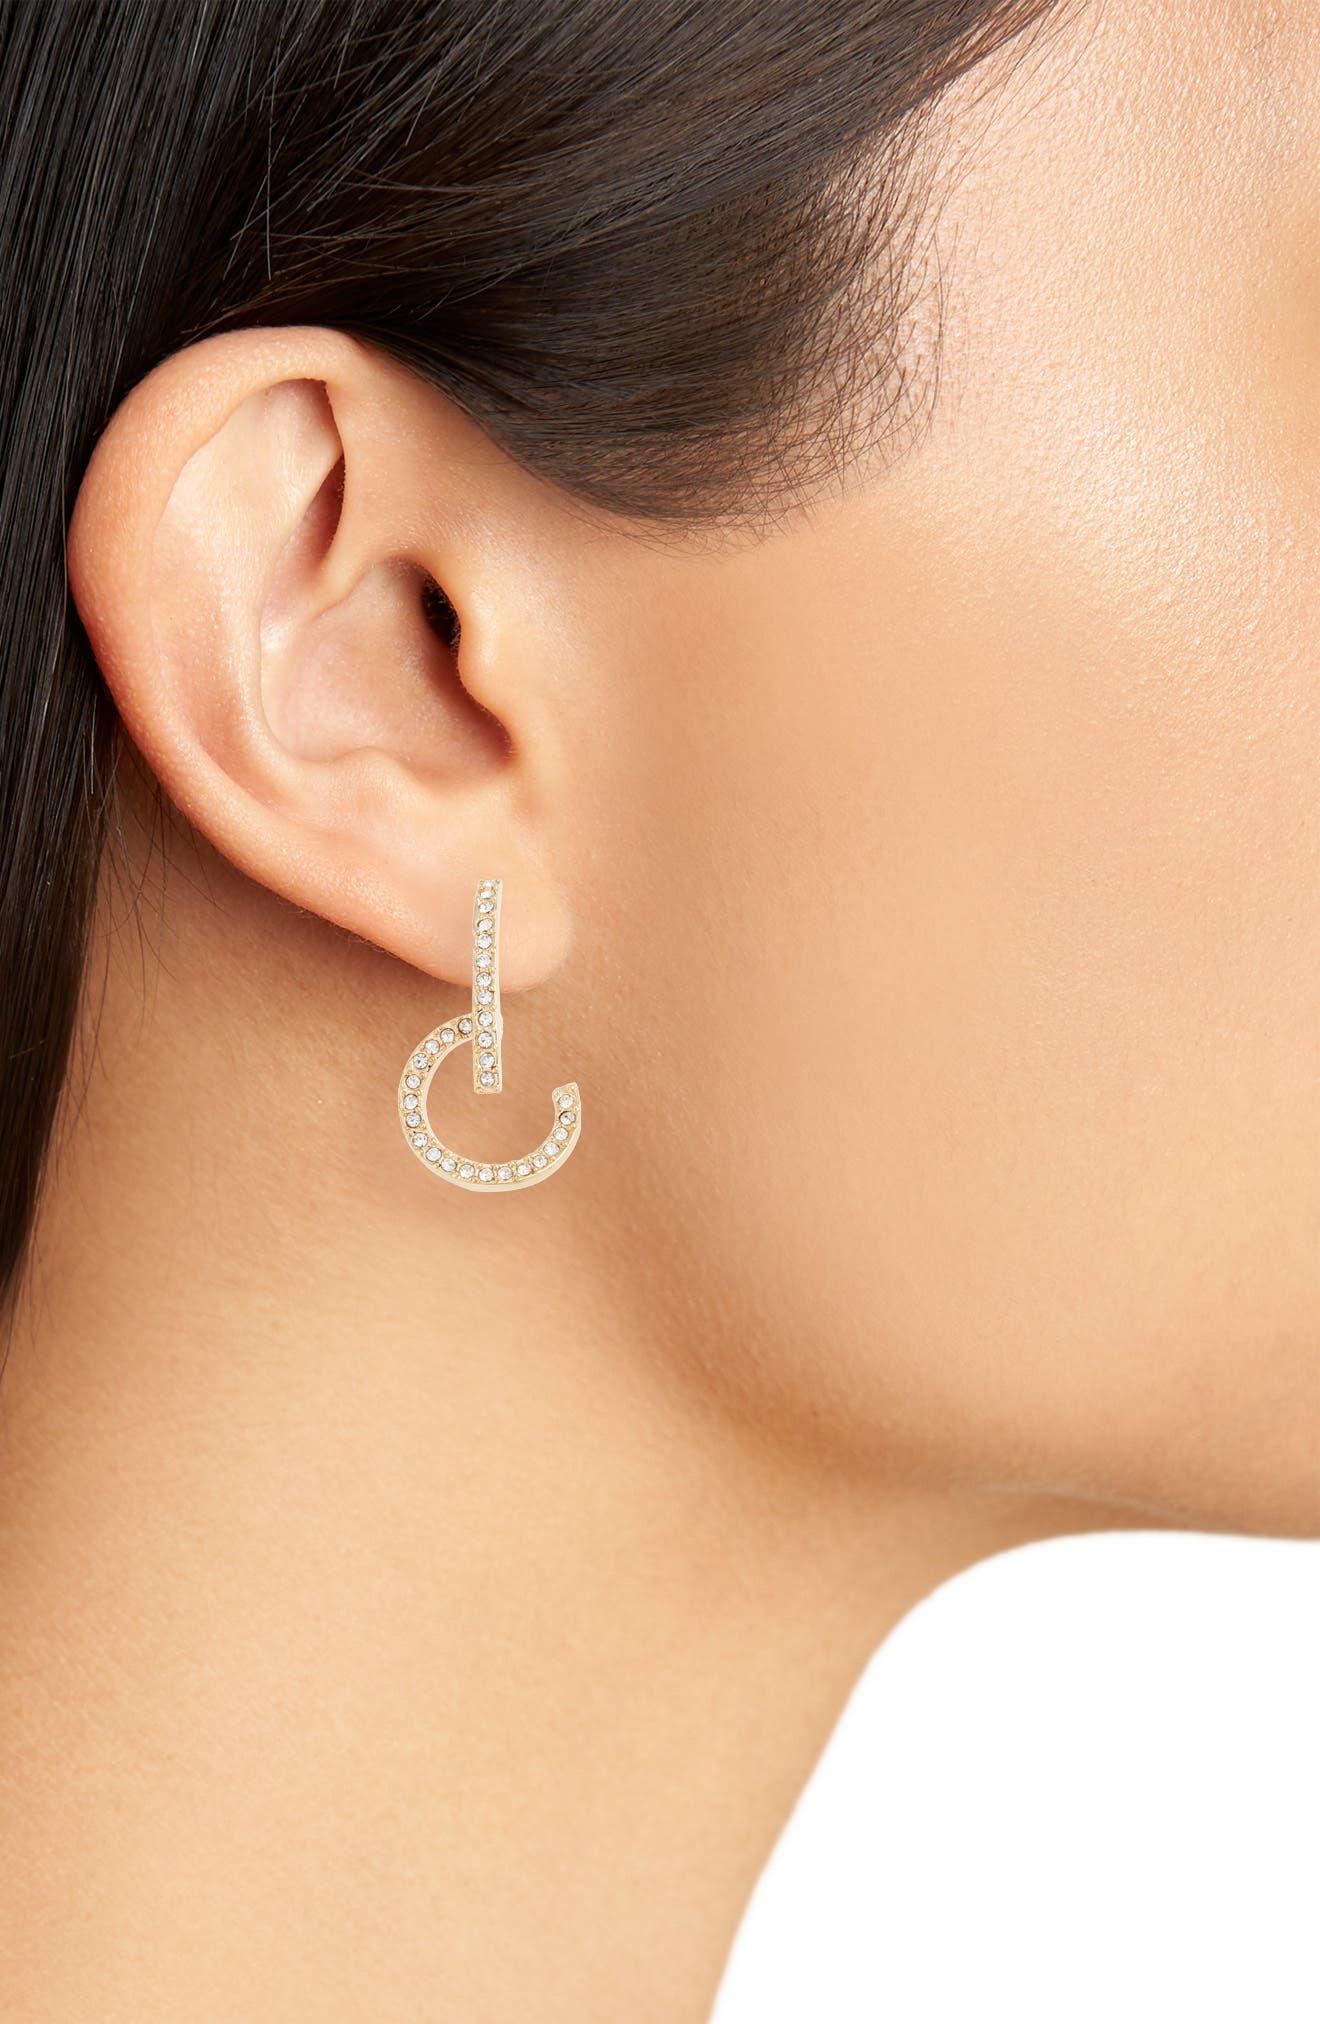 Lobe and Hoop Earrings,                             Alternate thumbnail 2, color,                             GOLD